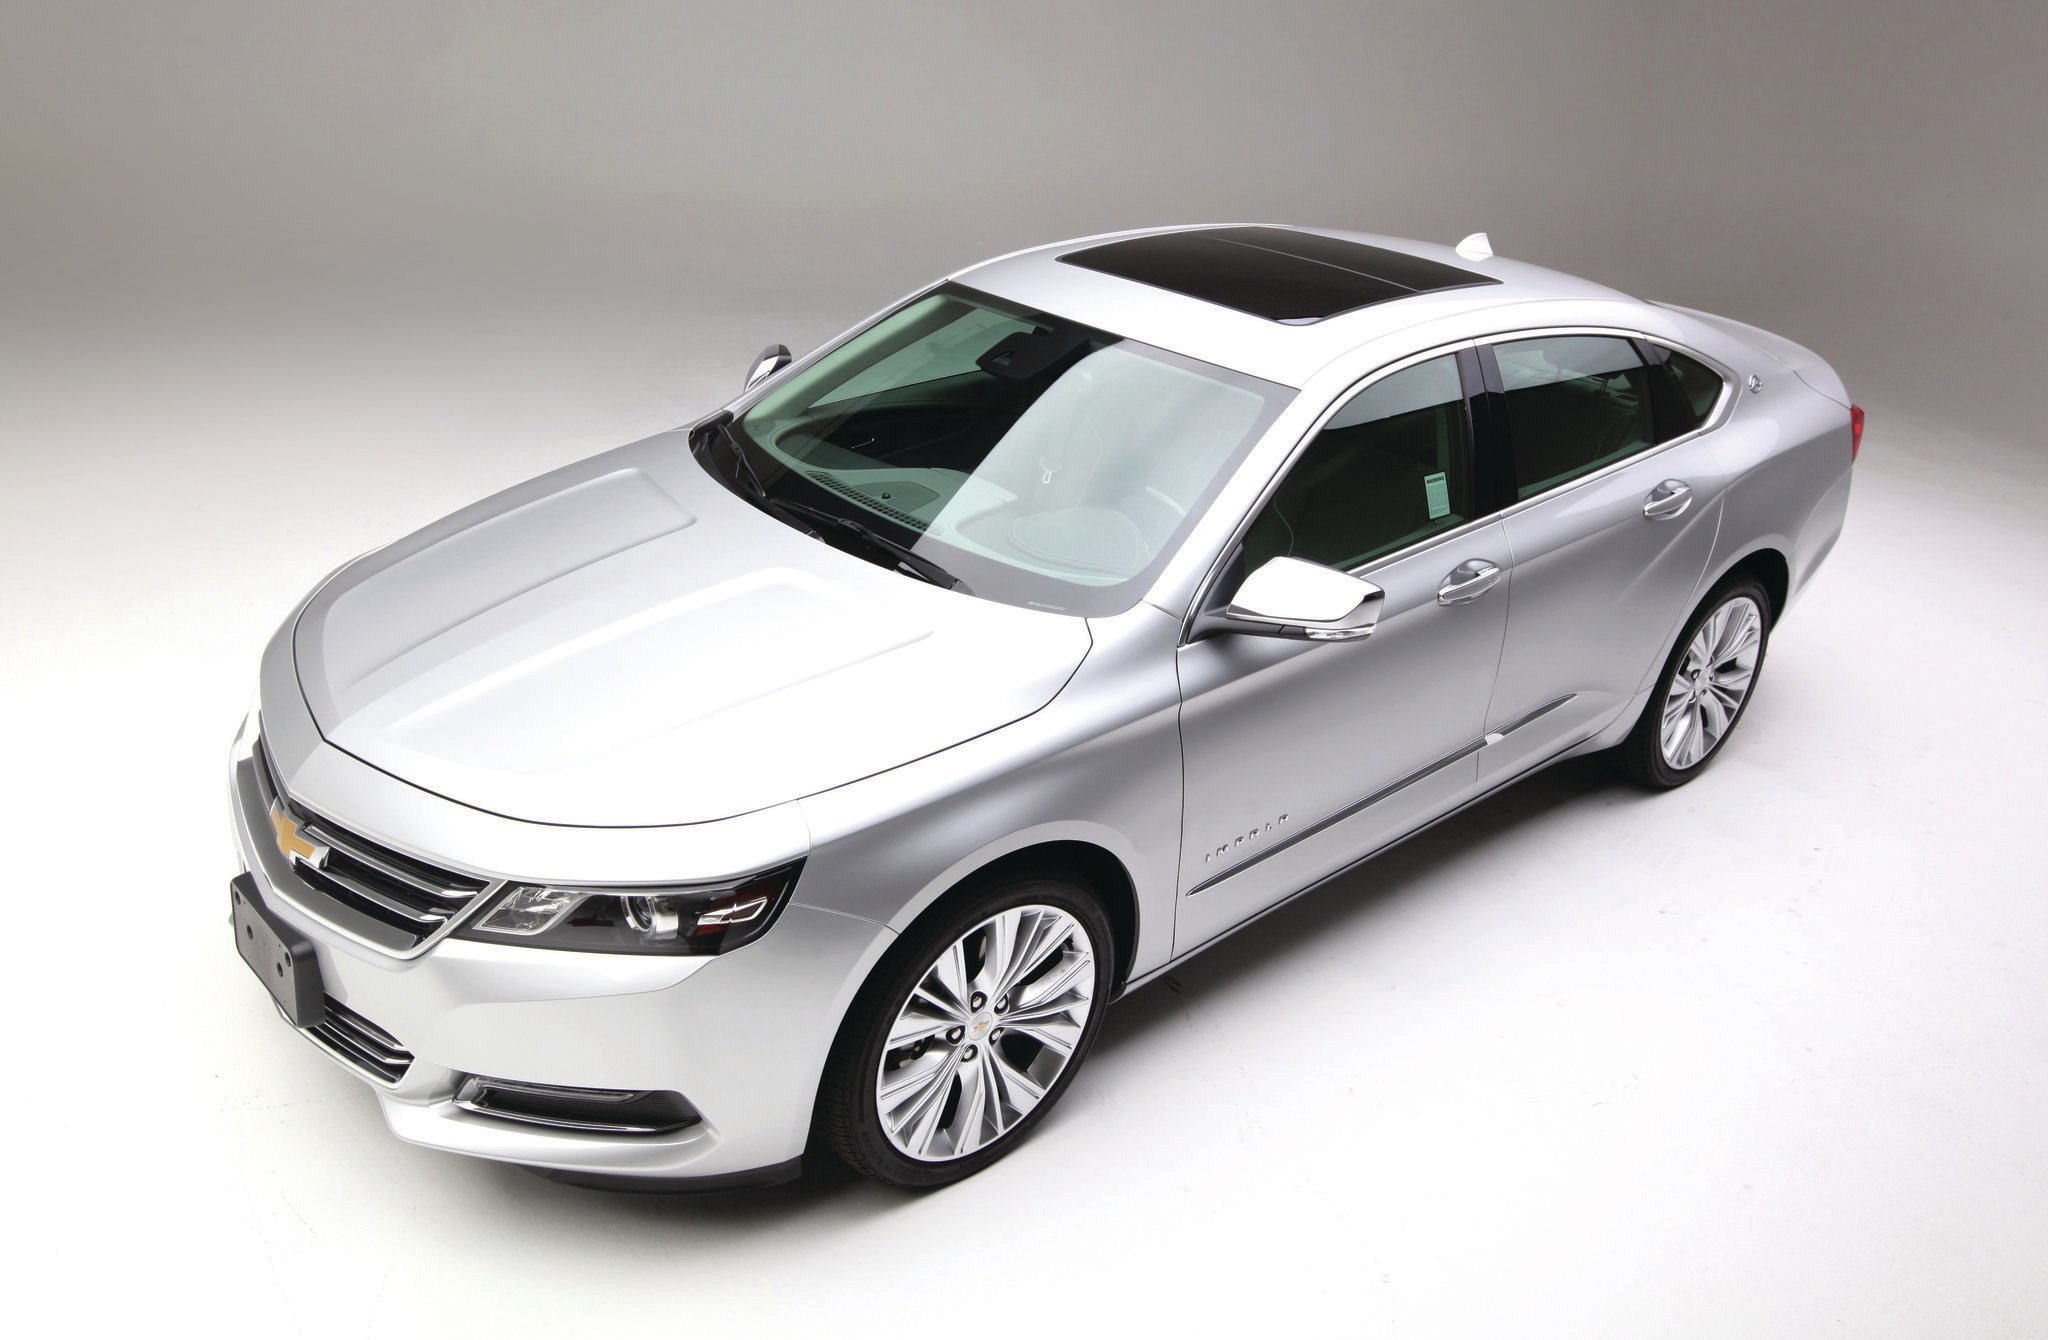 ltz bumper for 2014 impala autos post. Black Bedroom Furniture Sets. Home Design Ideas